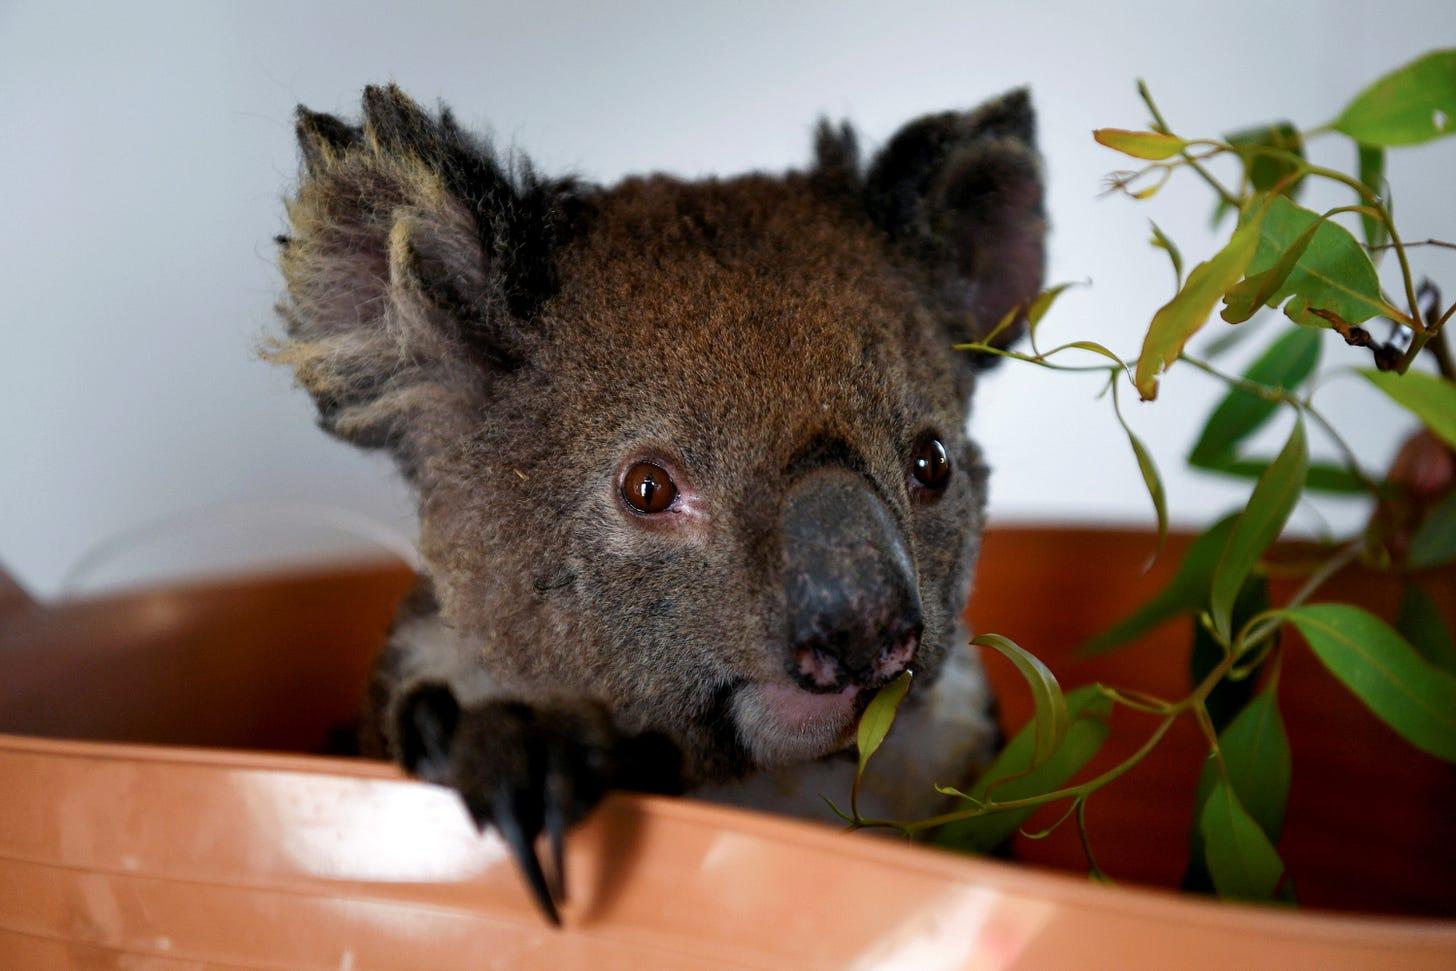 An injured koala is treated at the Kangaroo Island Wildlife Park, at the Wildlife Emergency Response Centre in Parndana, Kangaroo Island, Australia January 19, 2020. REUTERS/Tracey Nearmy/File Photo